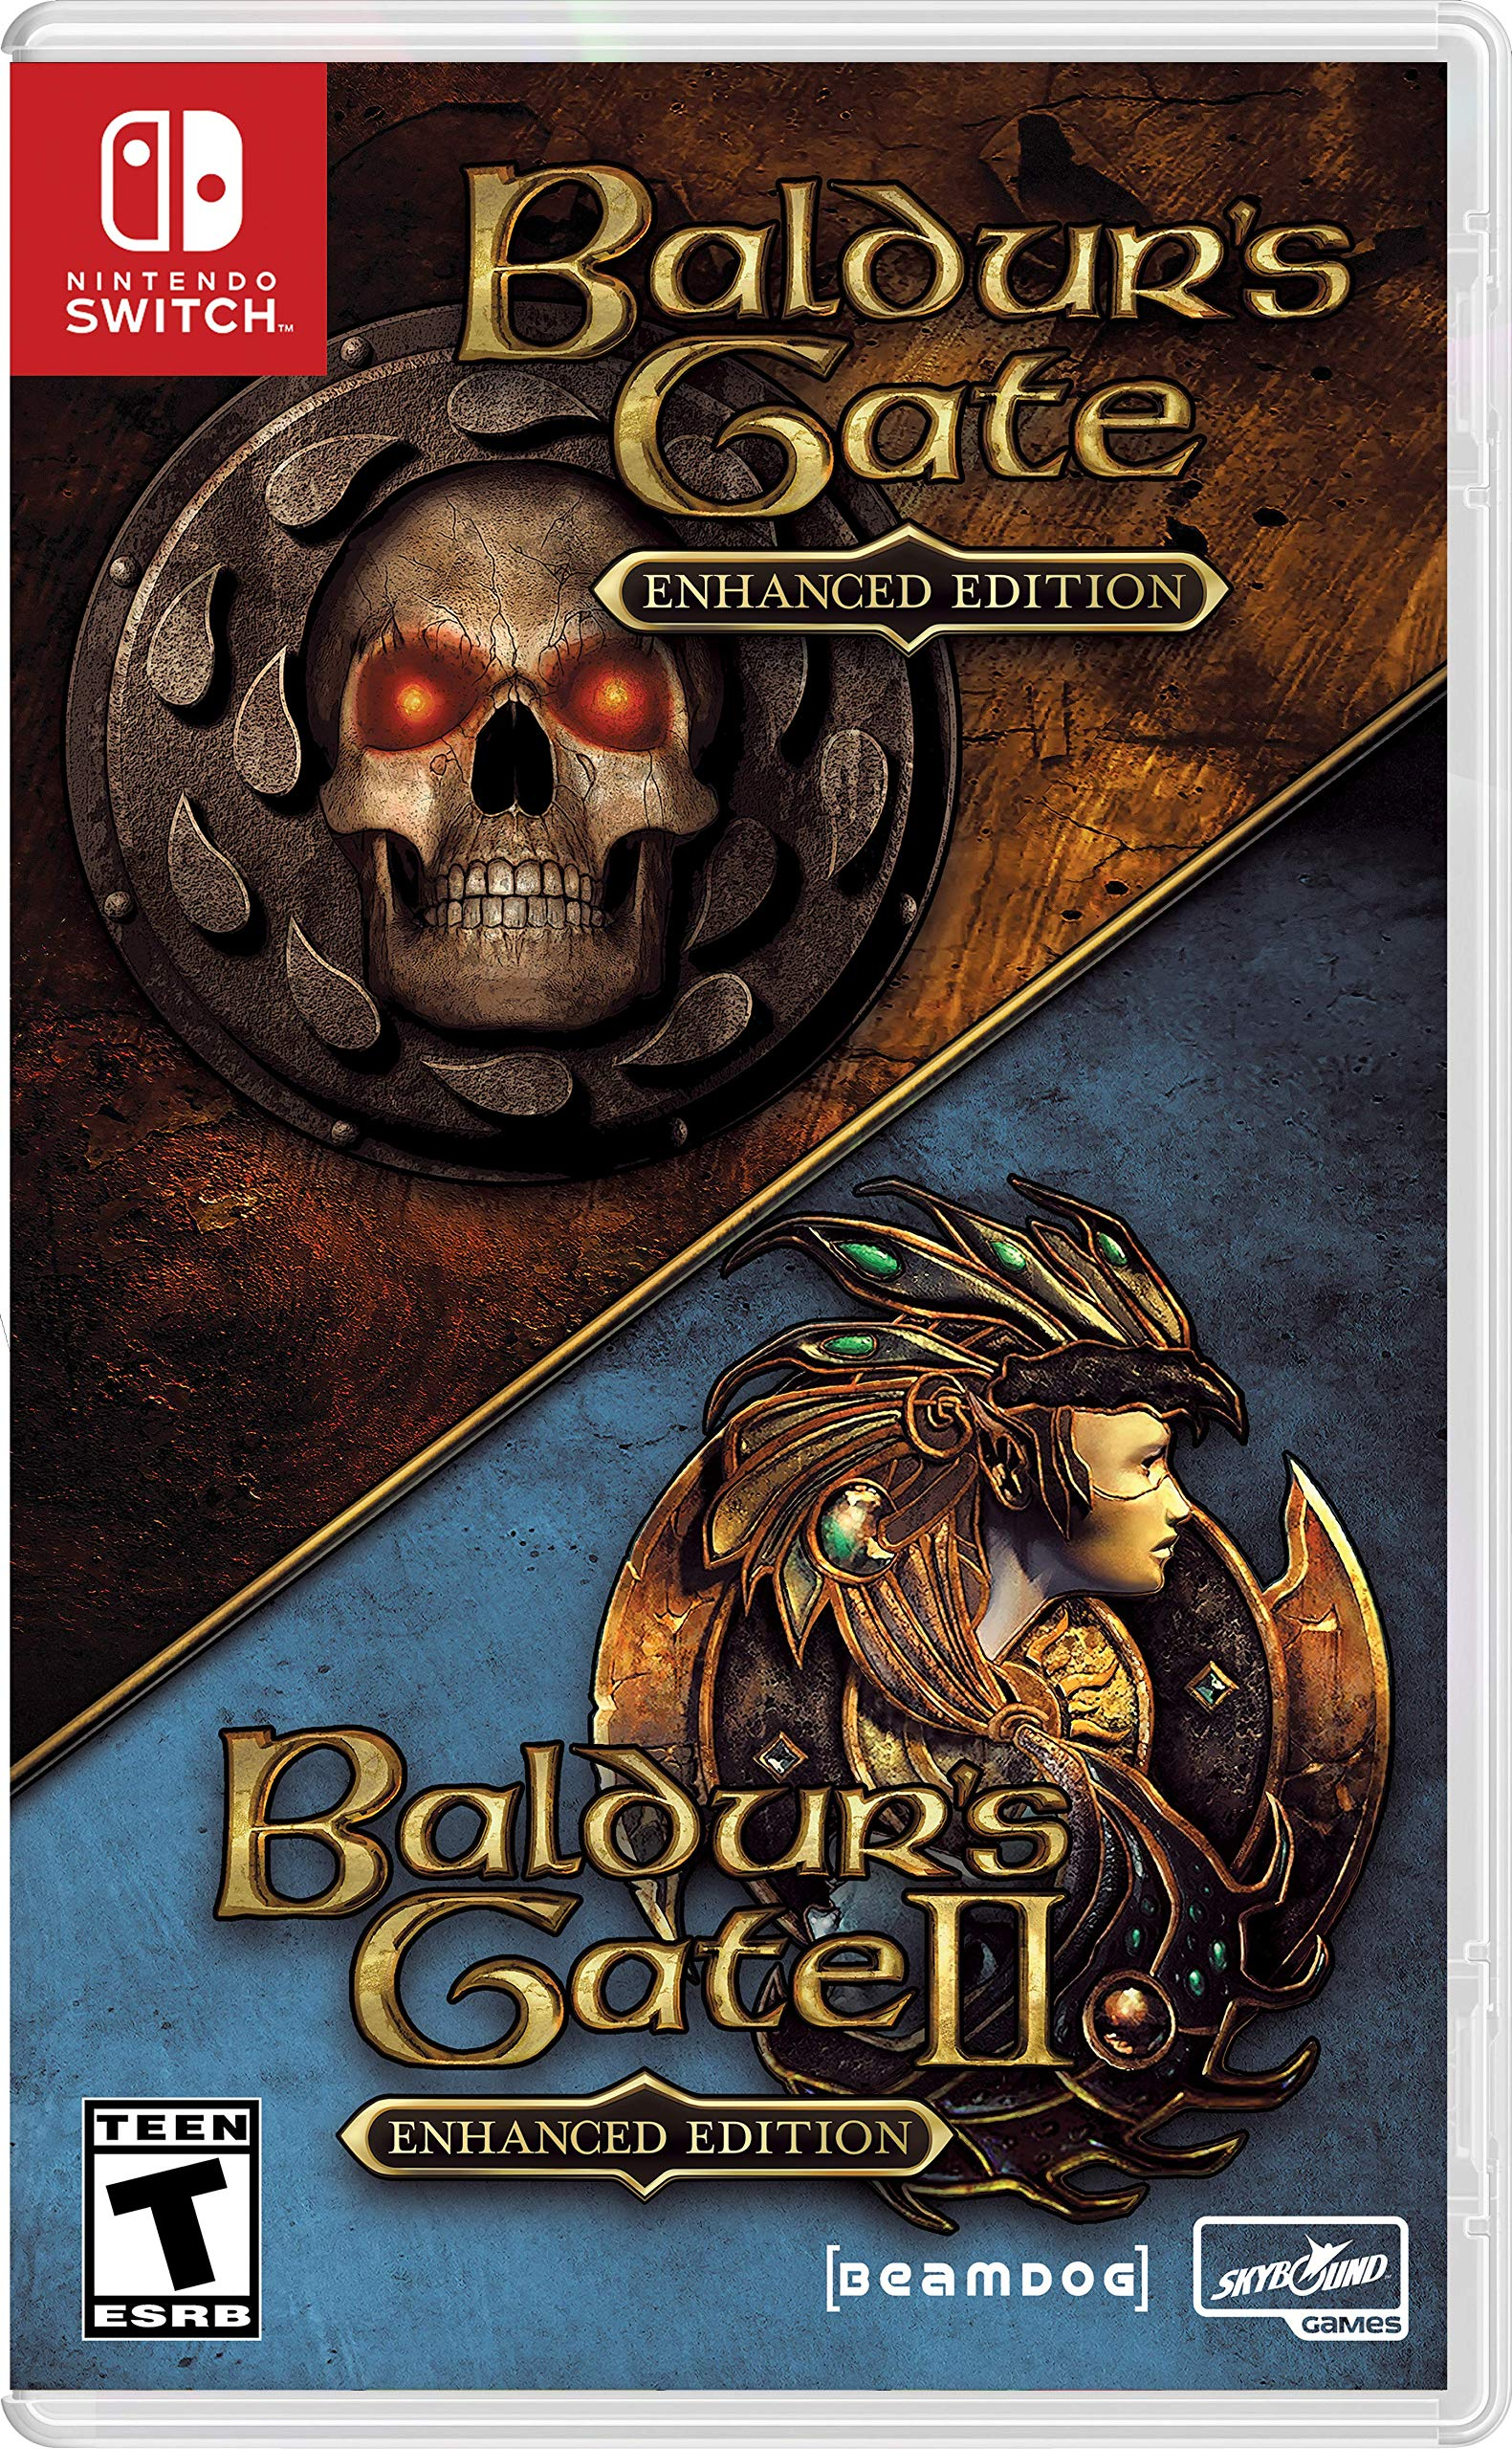 Baldur's Gate - Nintendo Switch Enhanced Edition